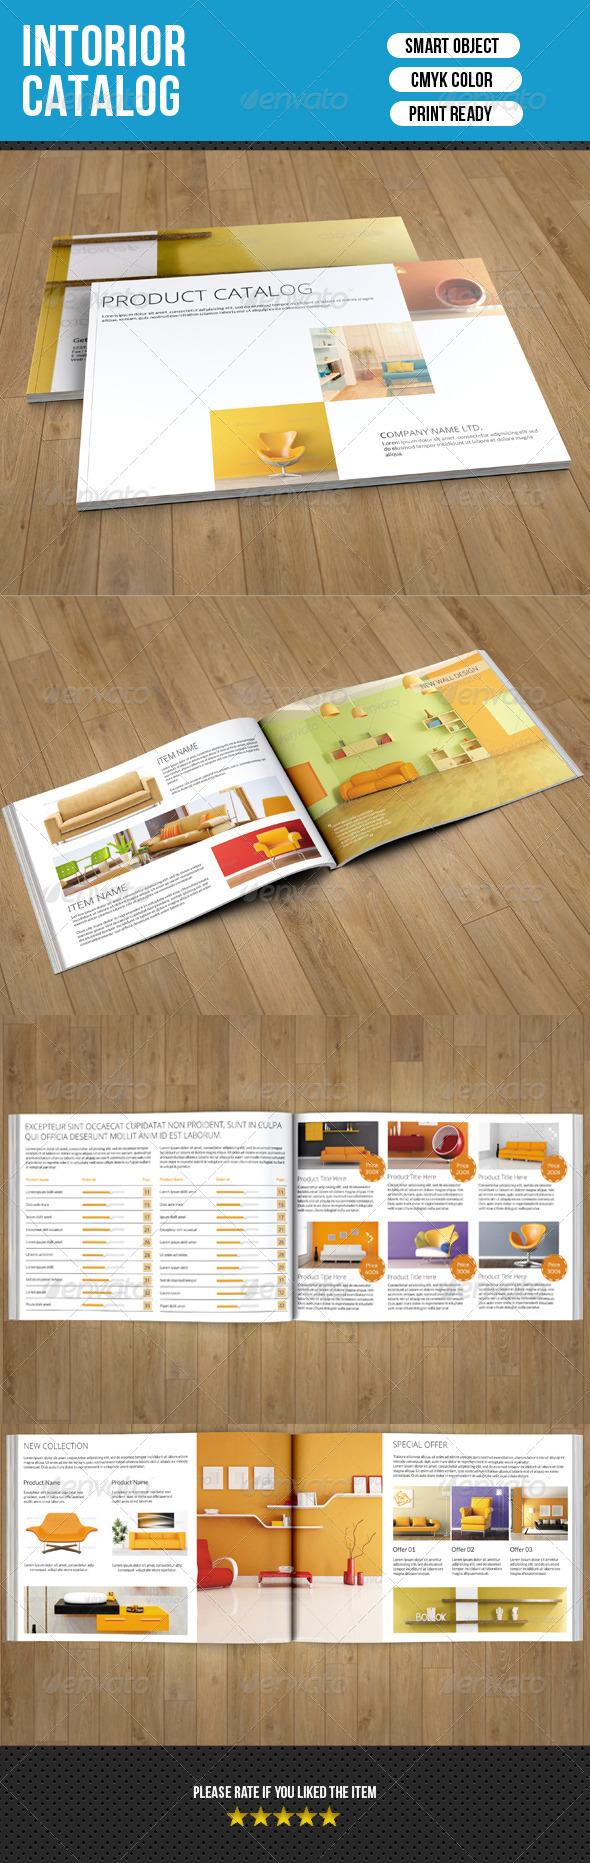 GraphicRiver Interior Catalog Template 7511882